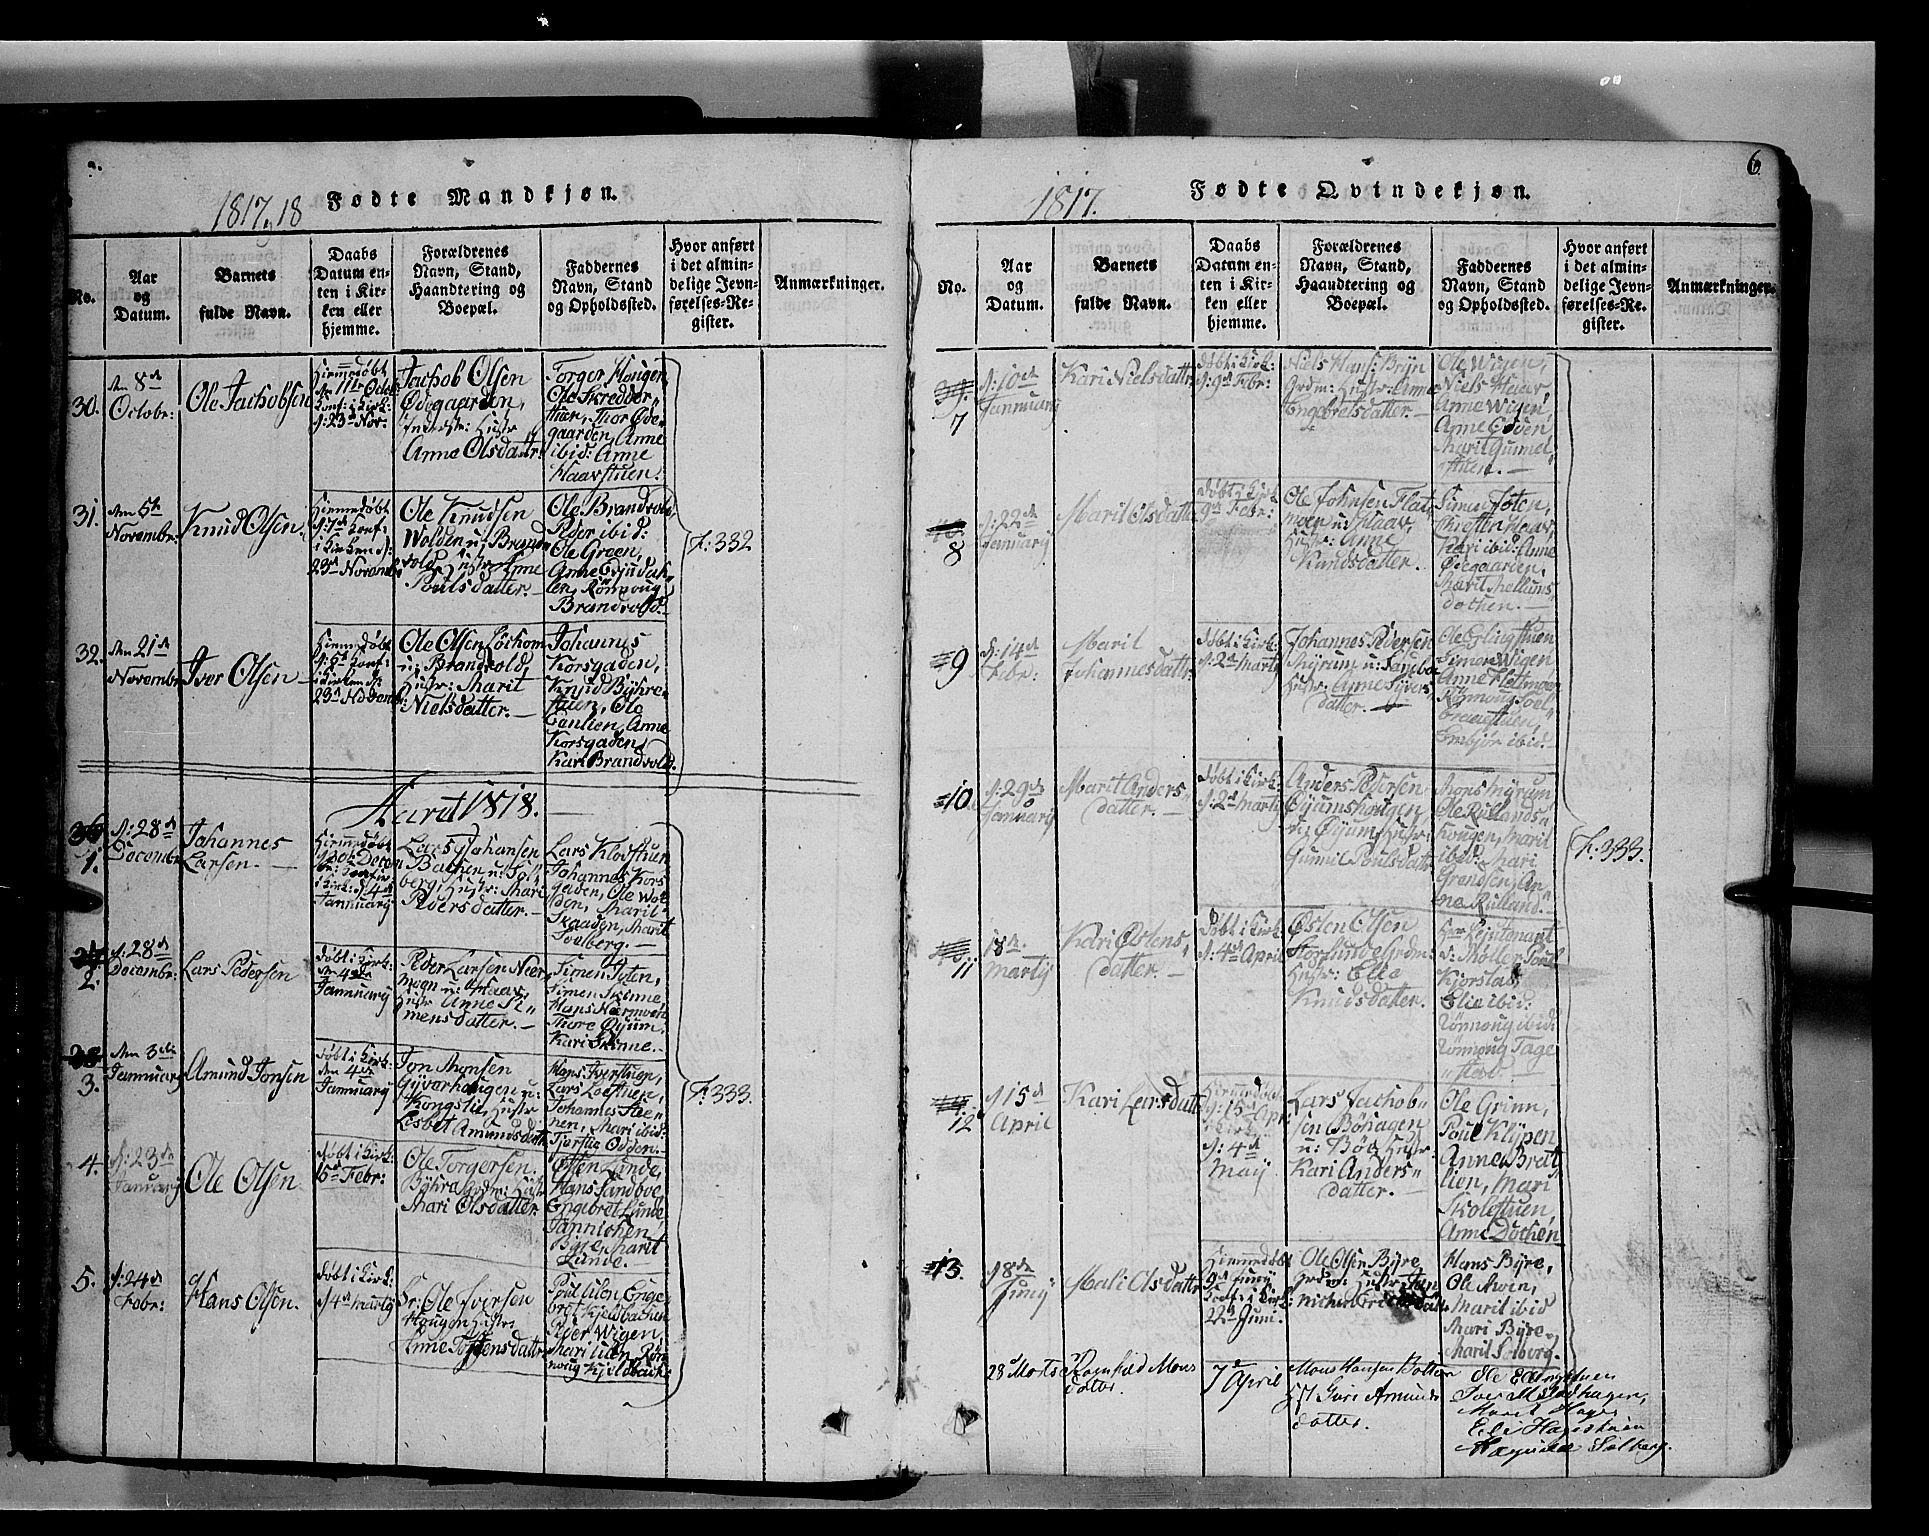 SAH, Fron prestekontor, H/Ha/Hab/L0004: Klokkerbok nr. 4, 1816-1850, s. 6